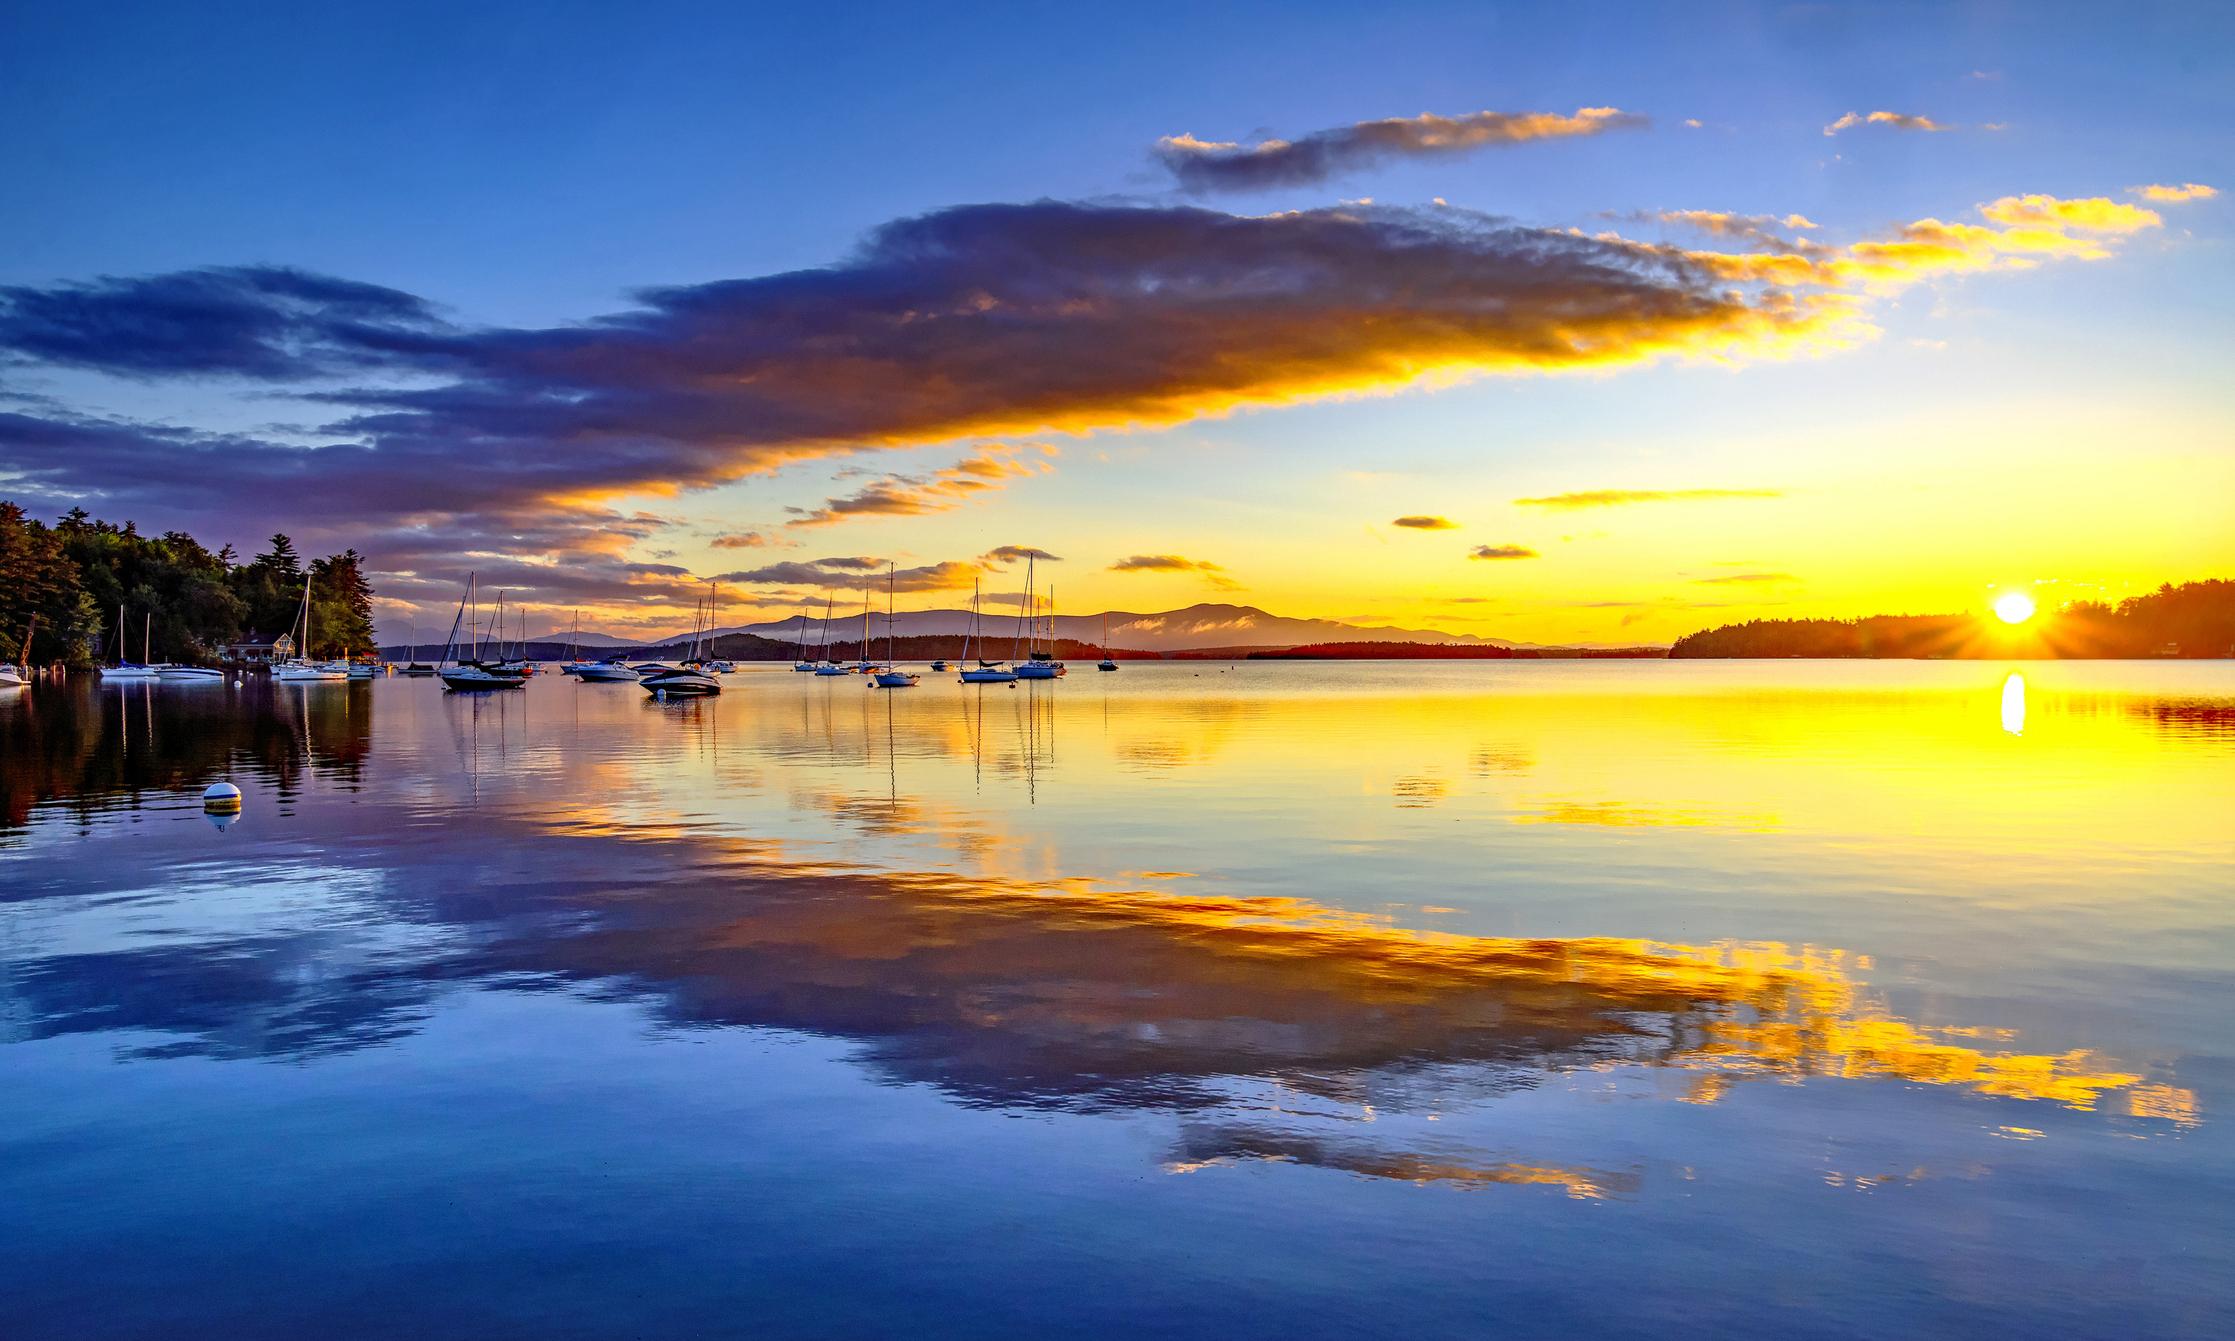 Early morning sunrise on Lake Winnipesaukee